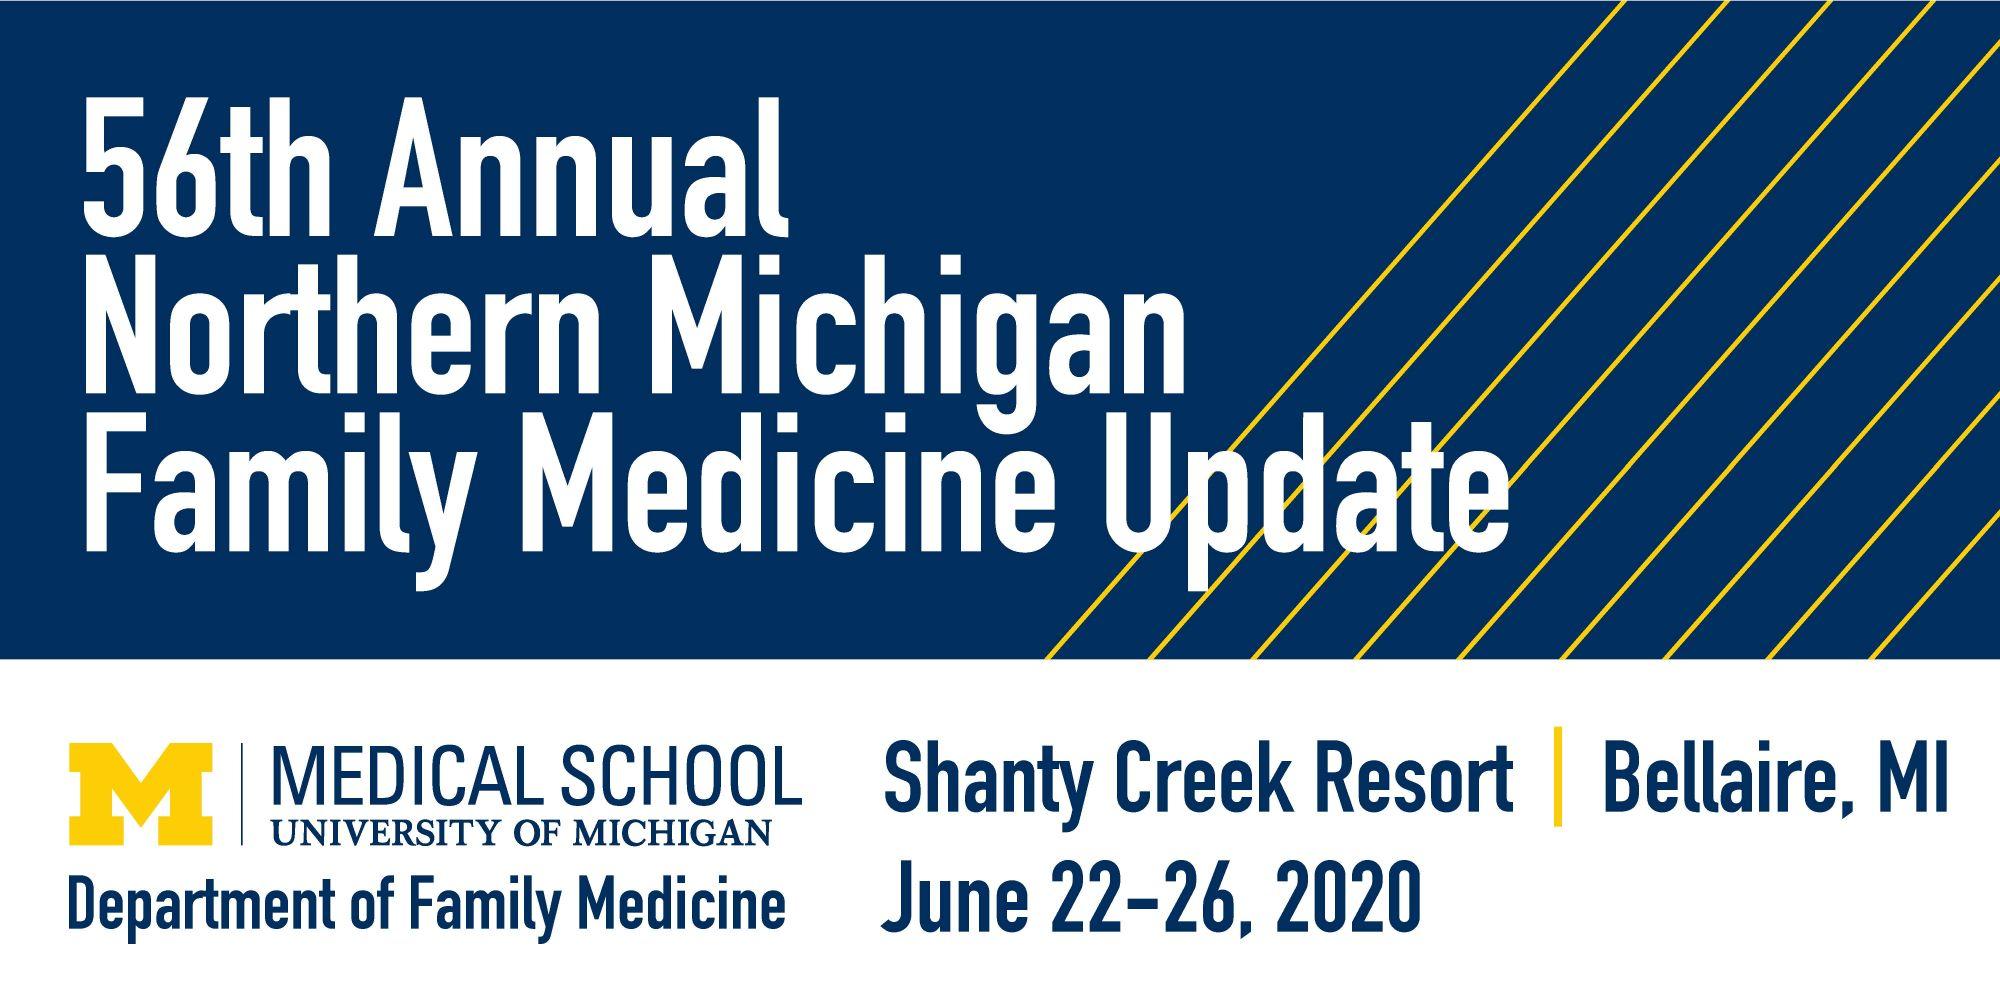 56th Annual Northern Michigan Family Medicine Update